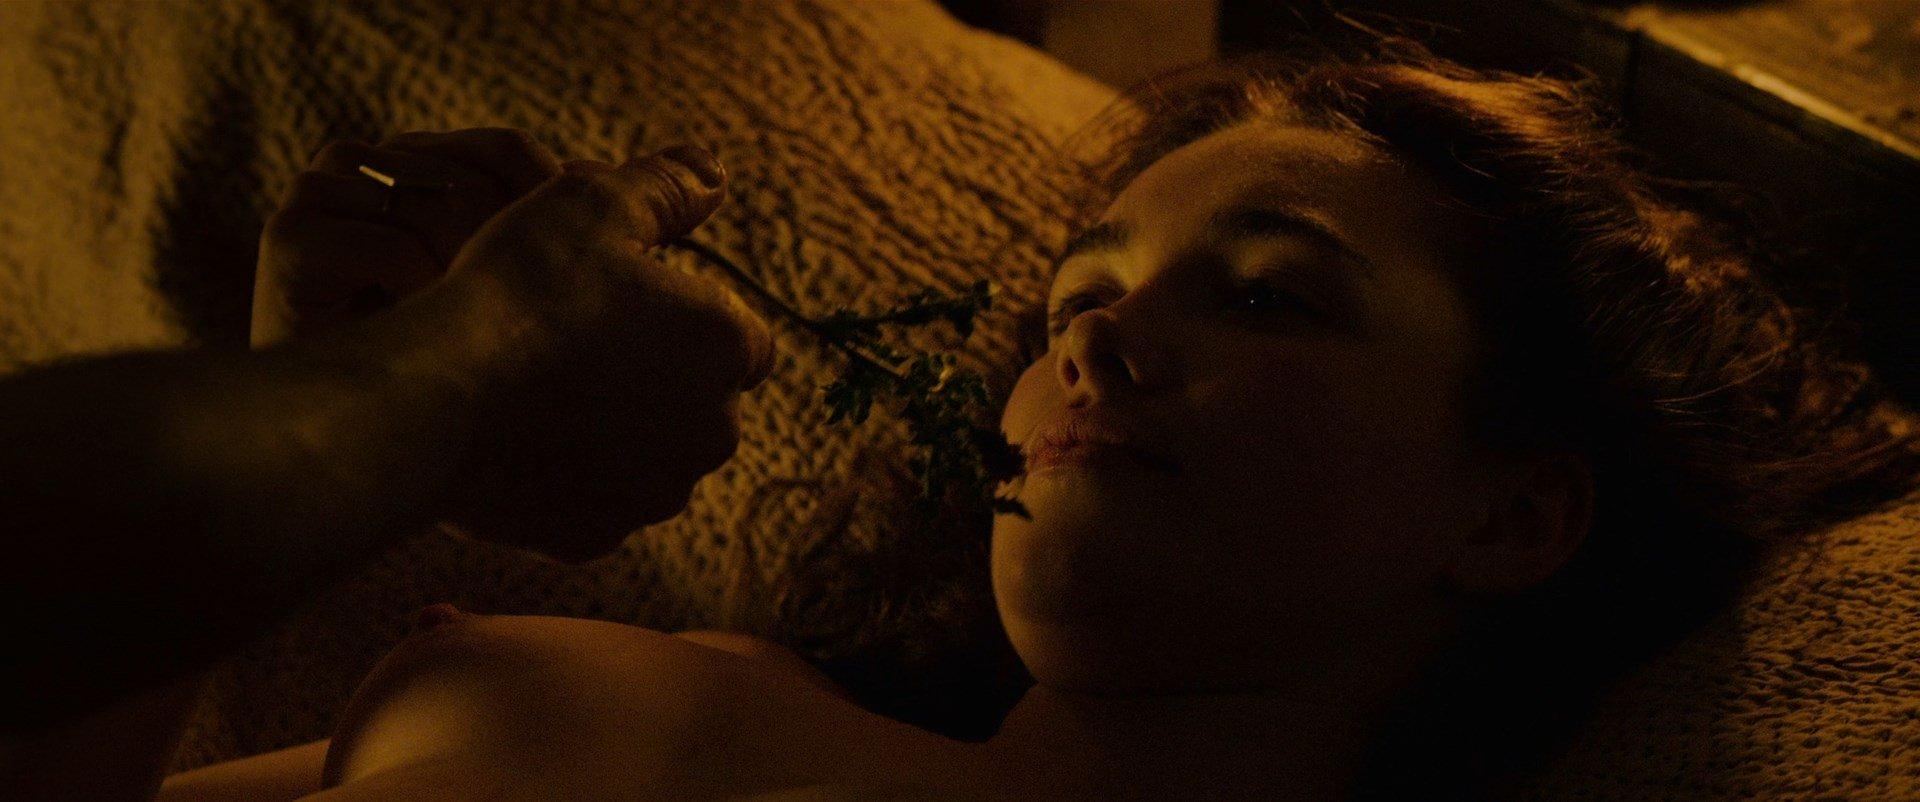 Tits Dwain Murphy nude (56 pics) Hot, Twitter, panties